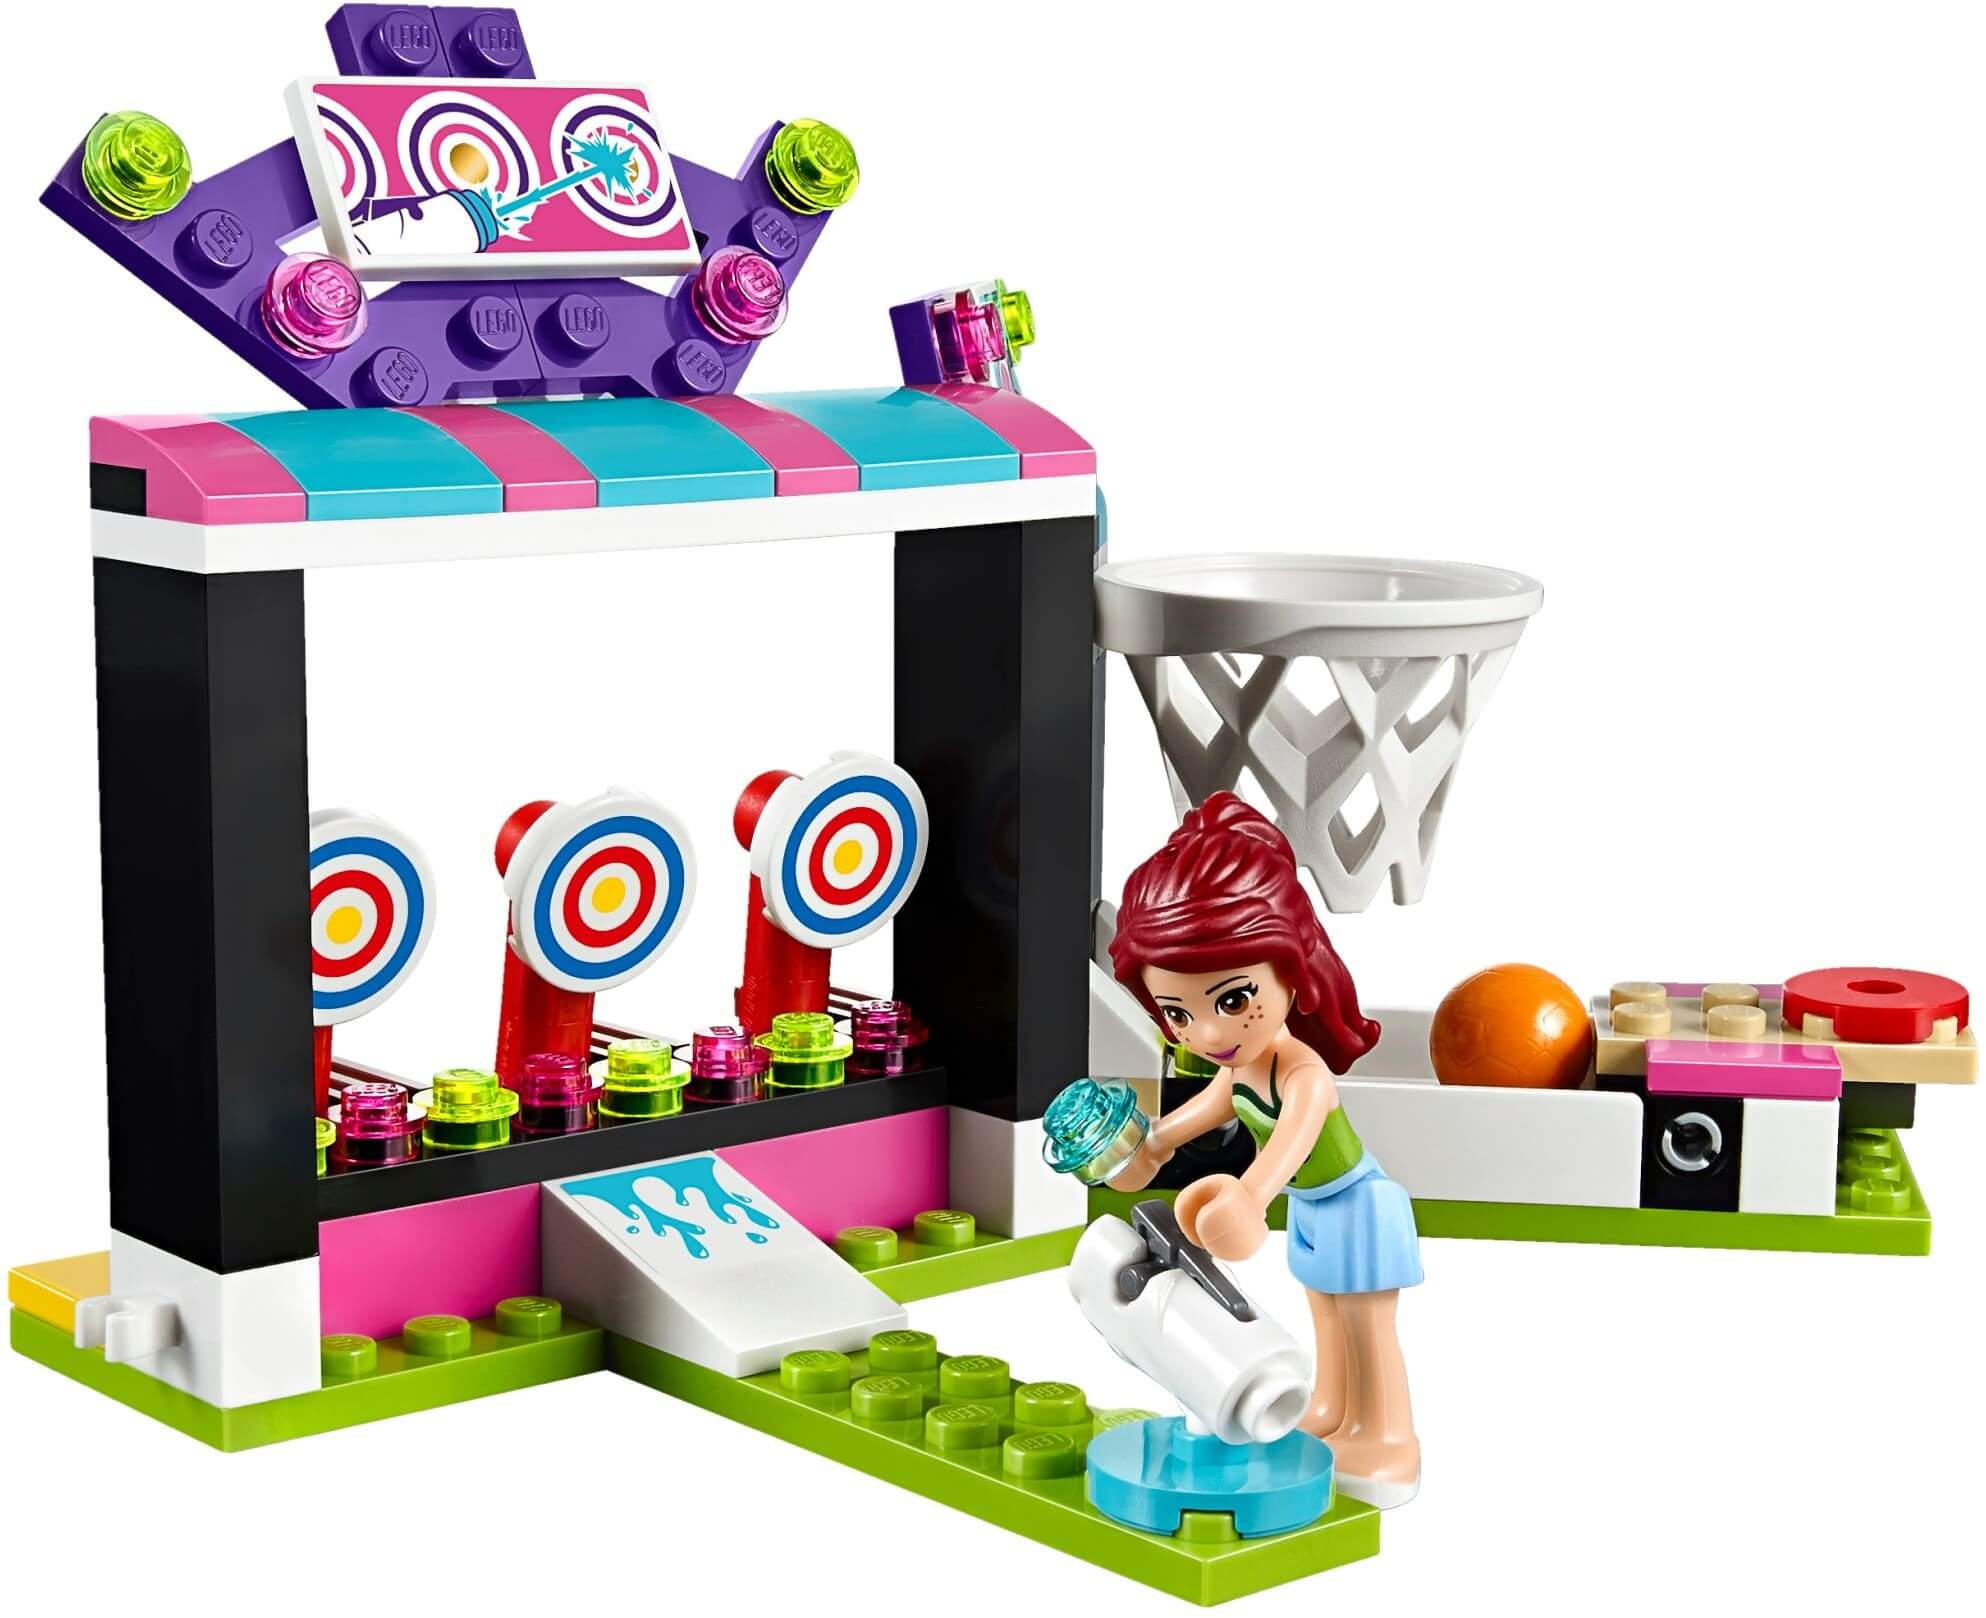 Mua đồ chơi LEGO 41127 - LEGO Friends 41127 - Khu Trò Chơi Giải Trí (LEGO Friends Amusement Park Arcade 41127)